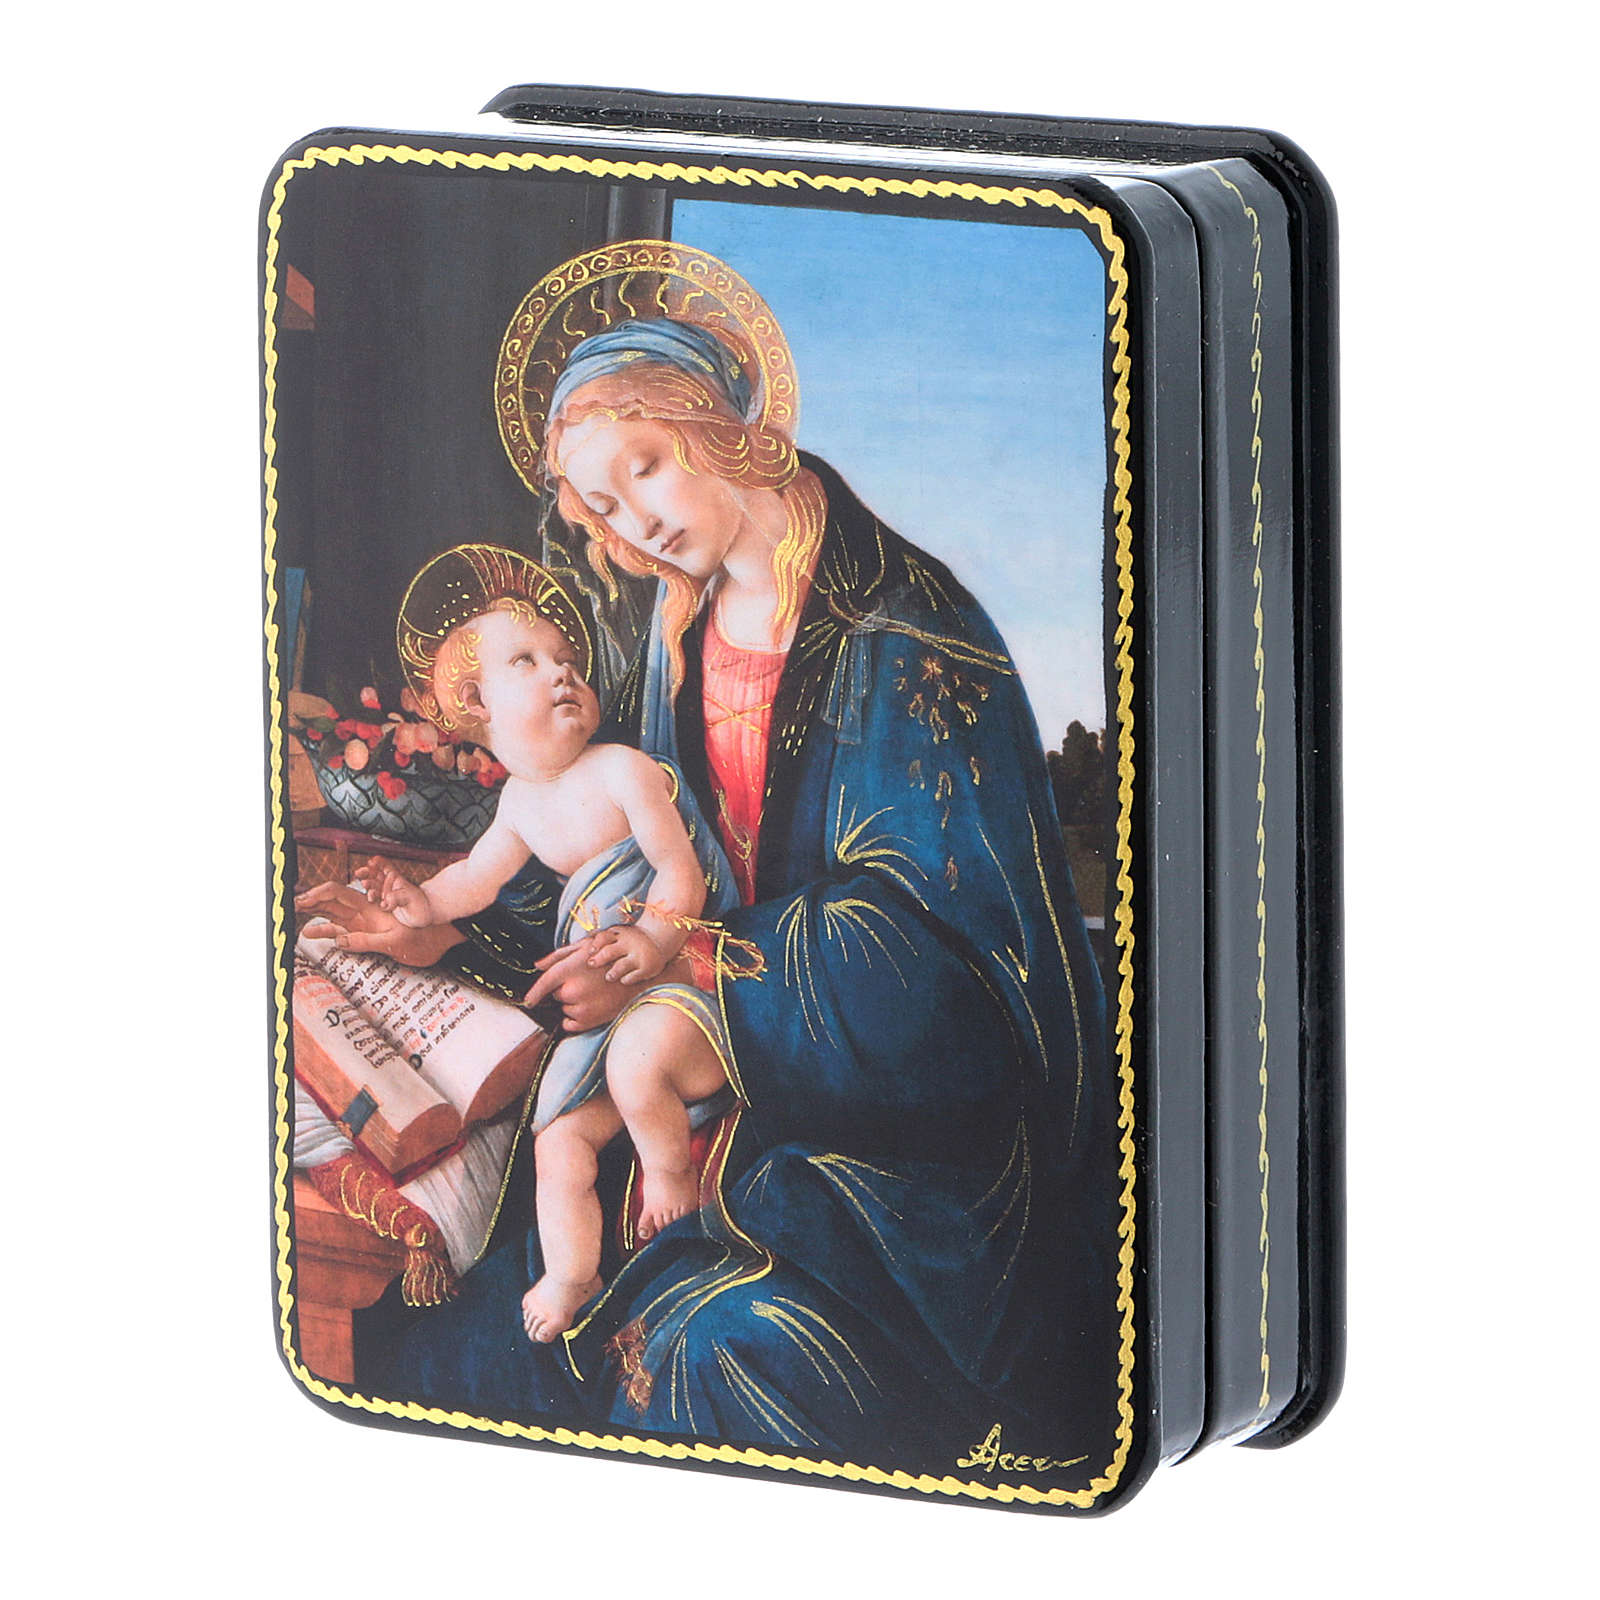 Scatola russa cartapesta Madonna del Magnificat Fedoskino style 11x8 4